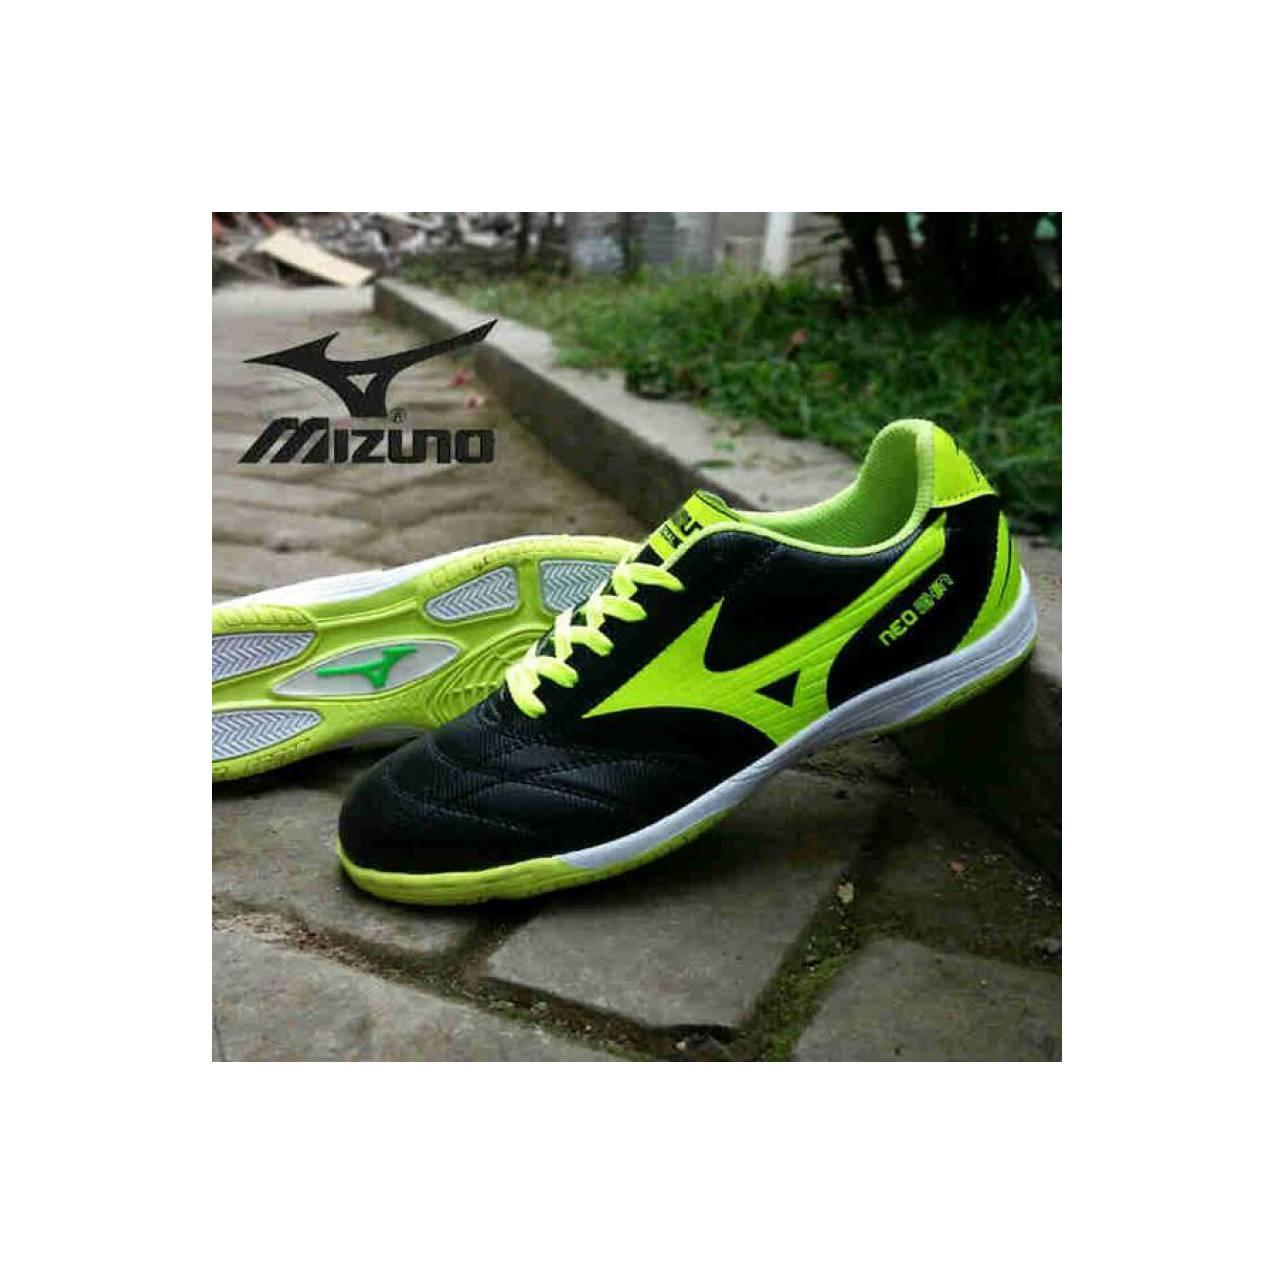 Jual mizuno futsal pria hitam Baru | Sepatu Futsal Original Model Te